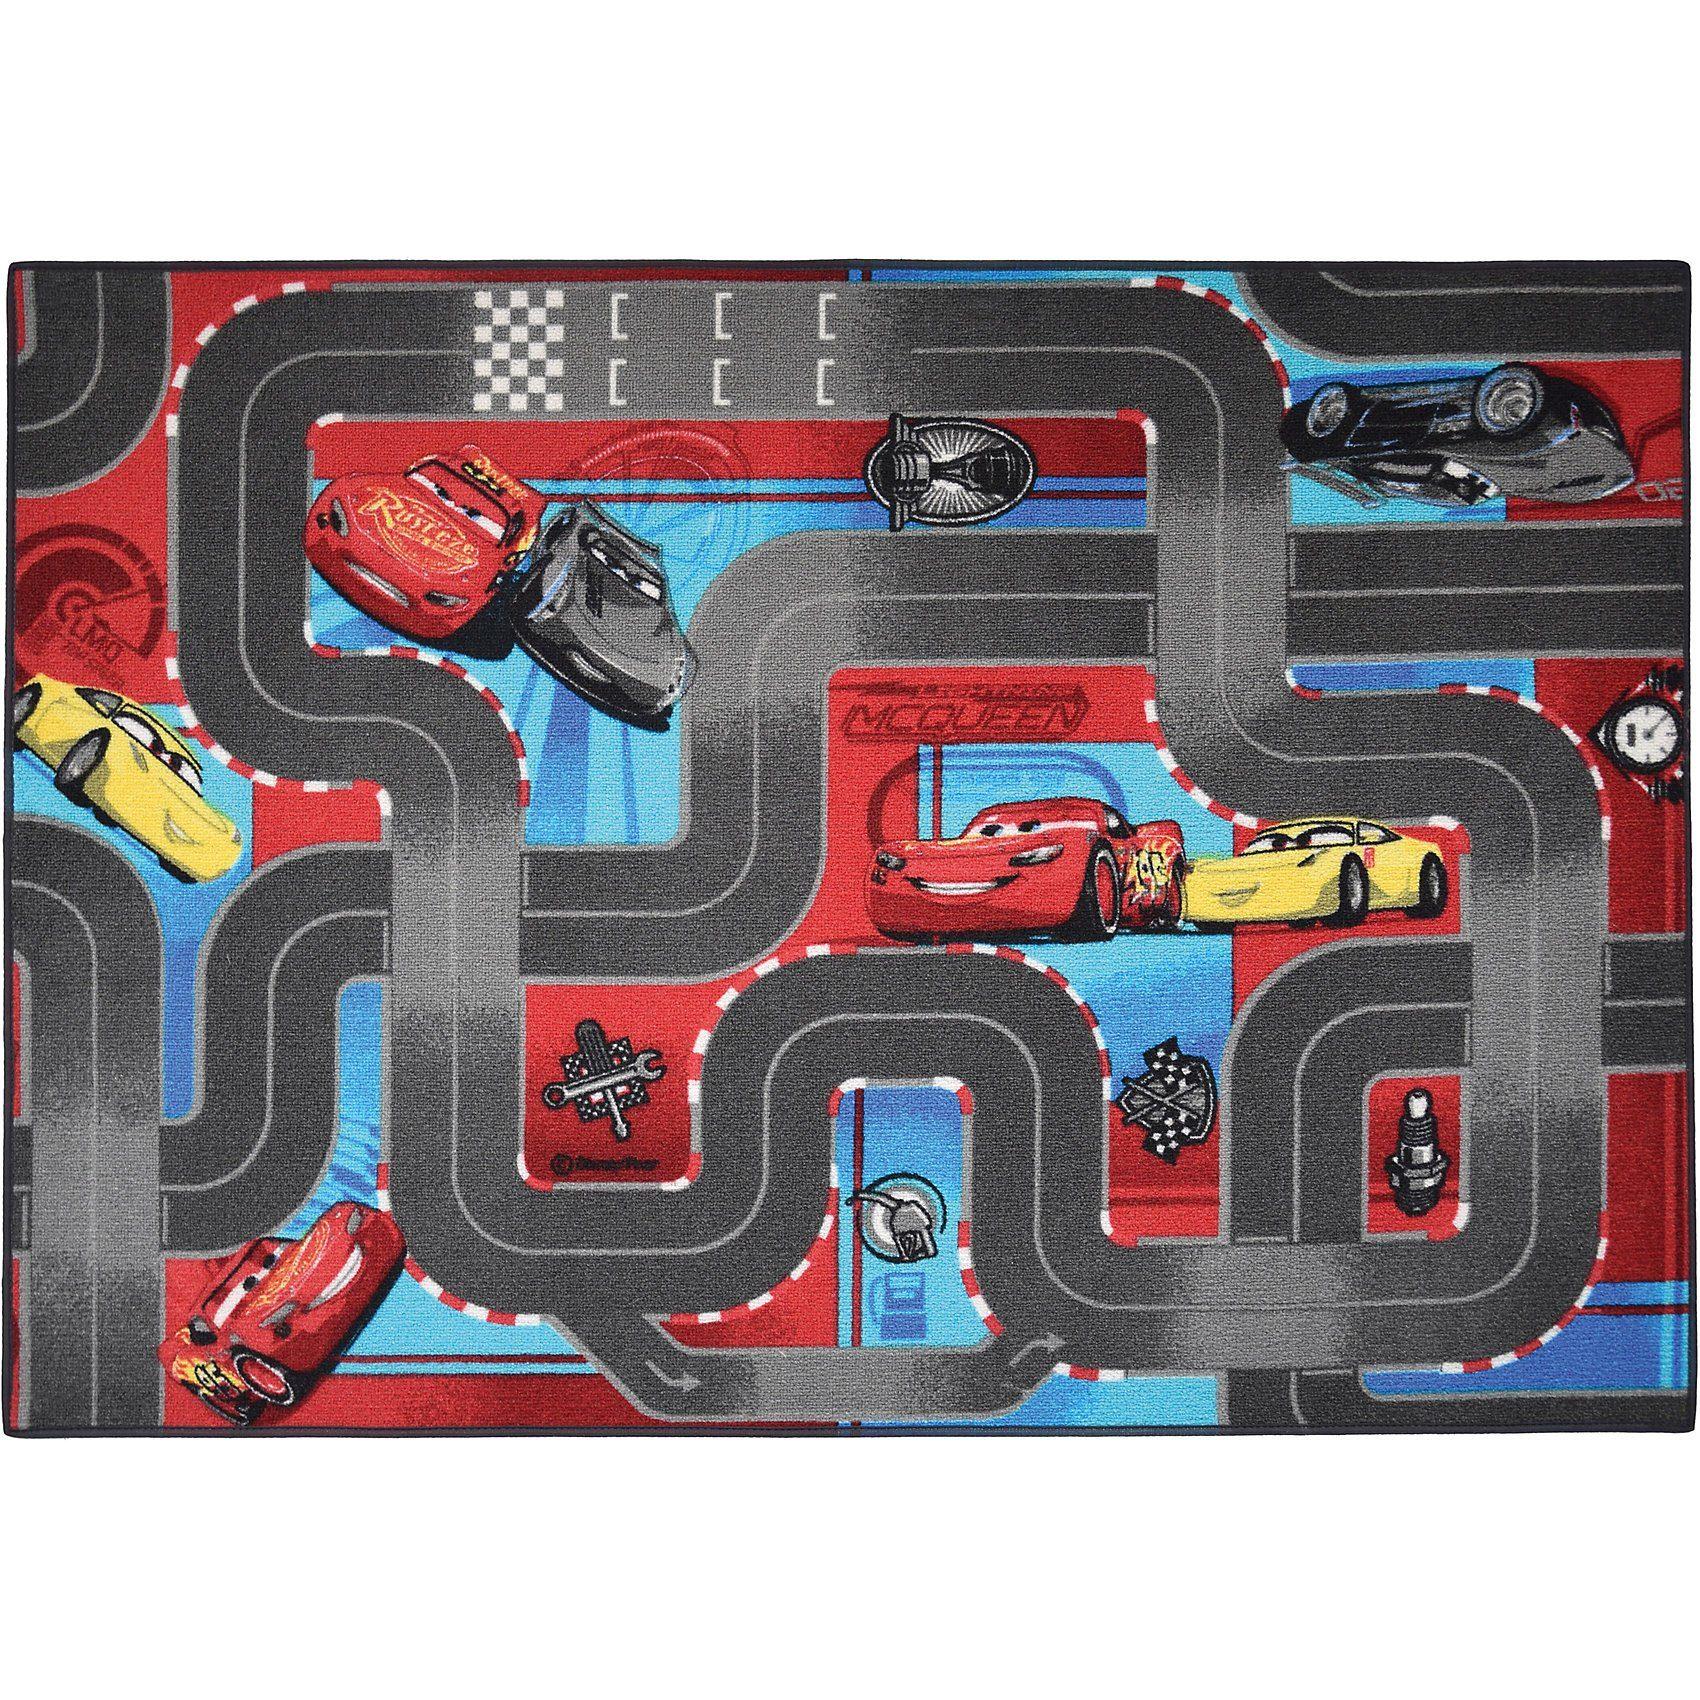 Kinderteppich Cars, Straßenkarte, 95 x 133 cm